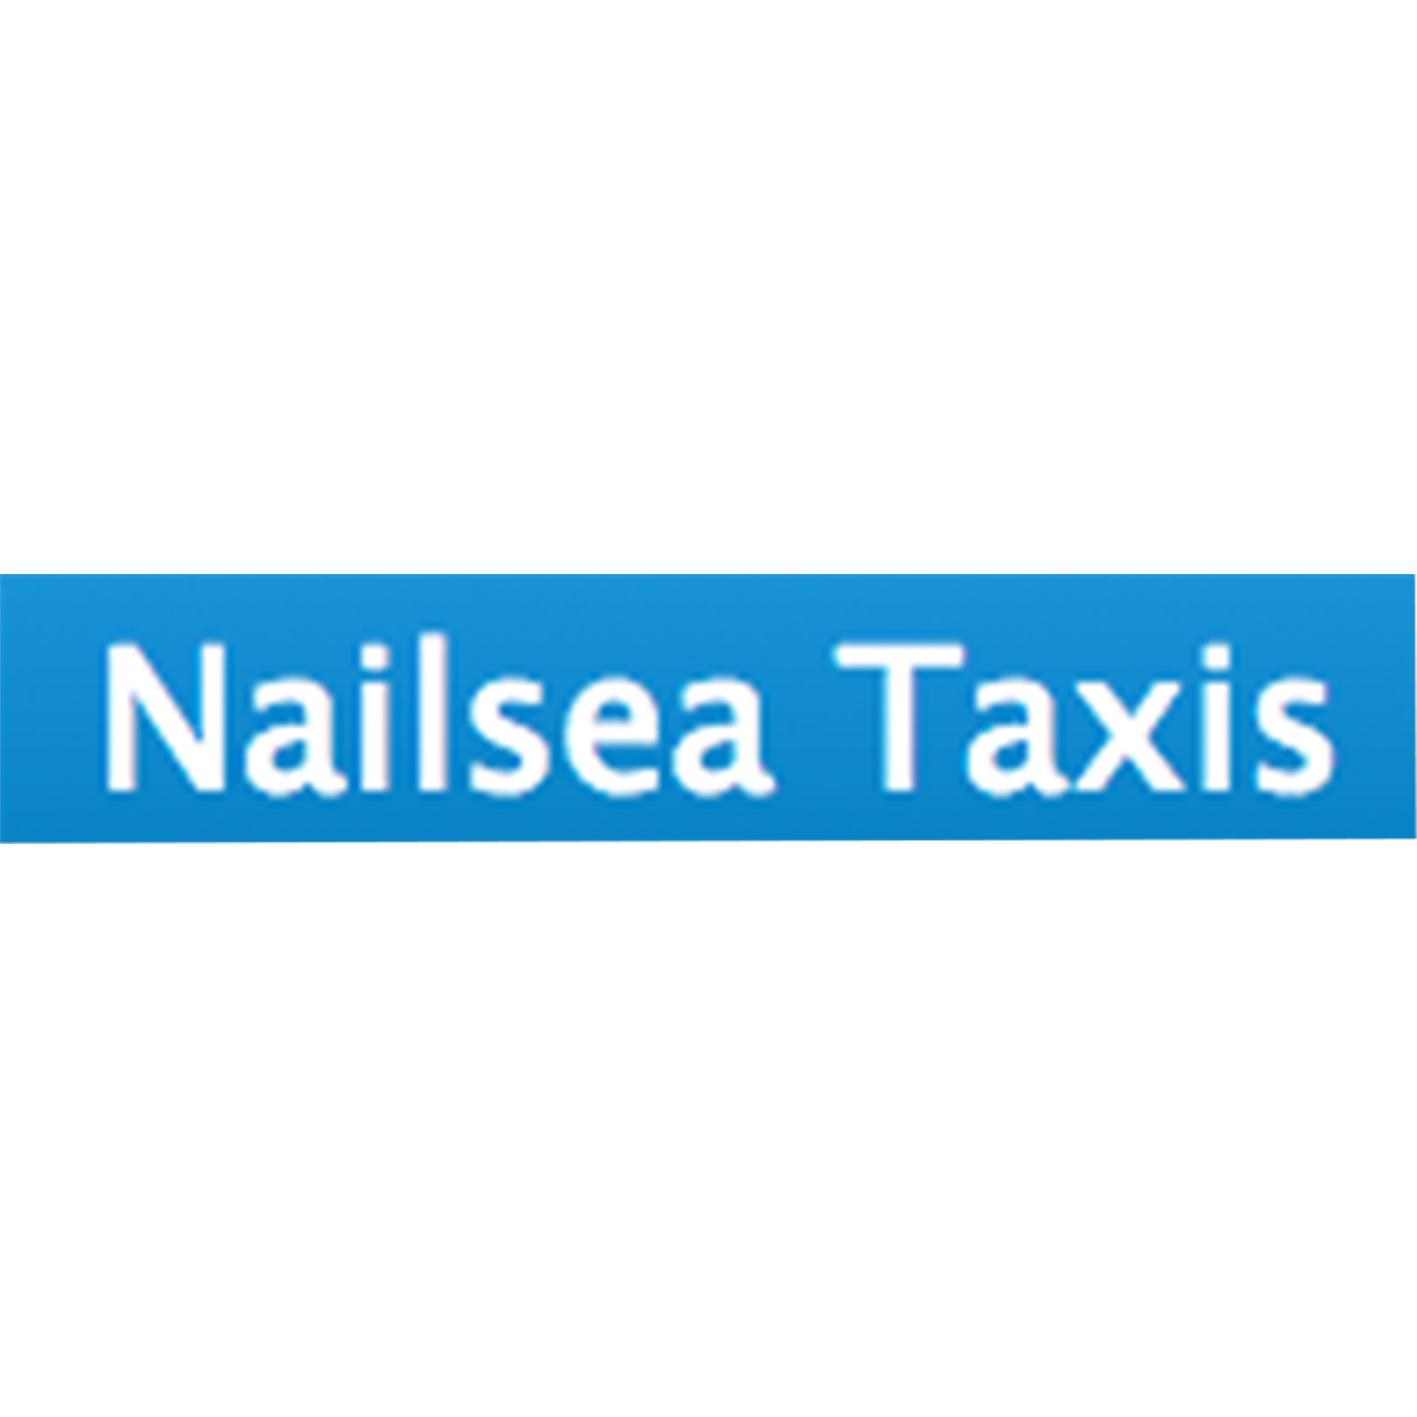 Nailsea Taxi